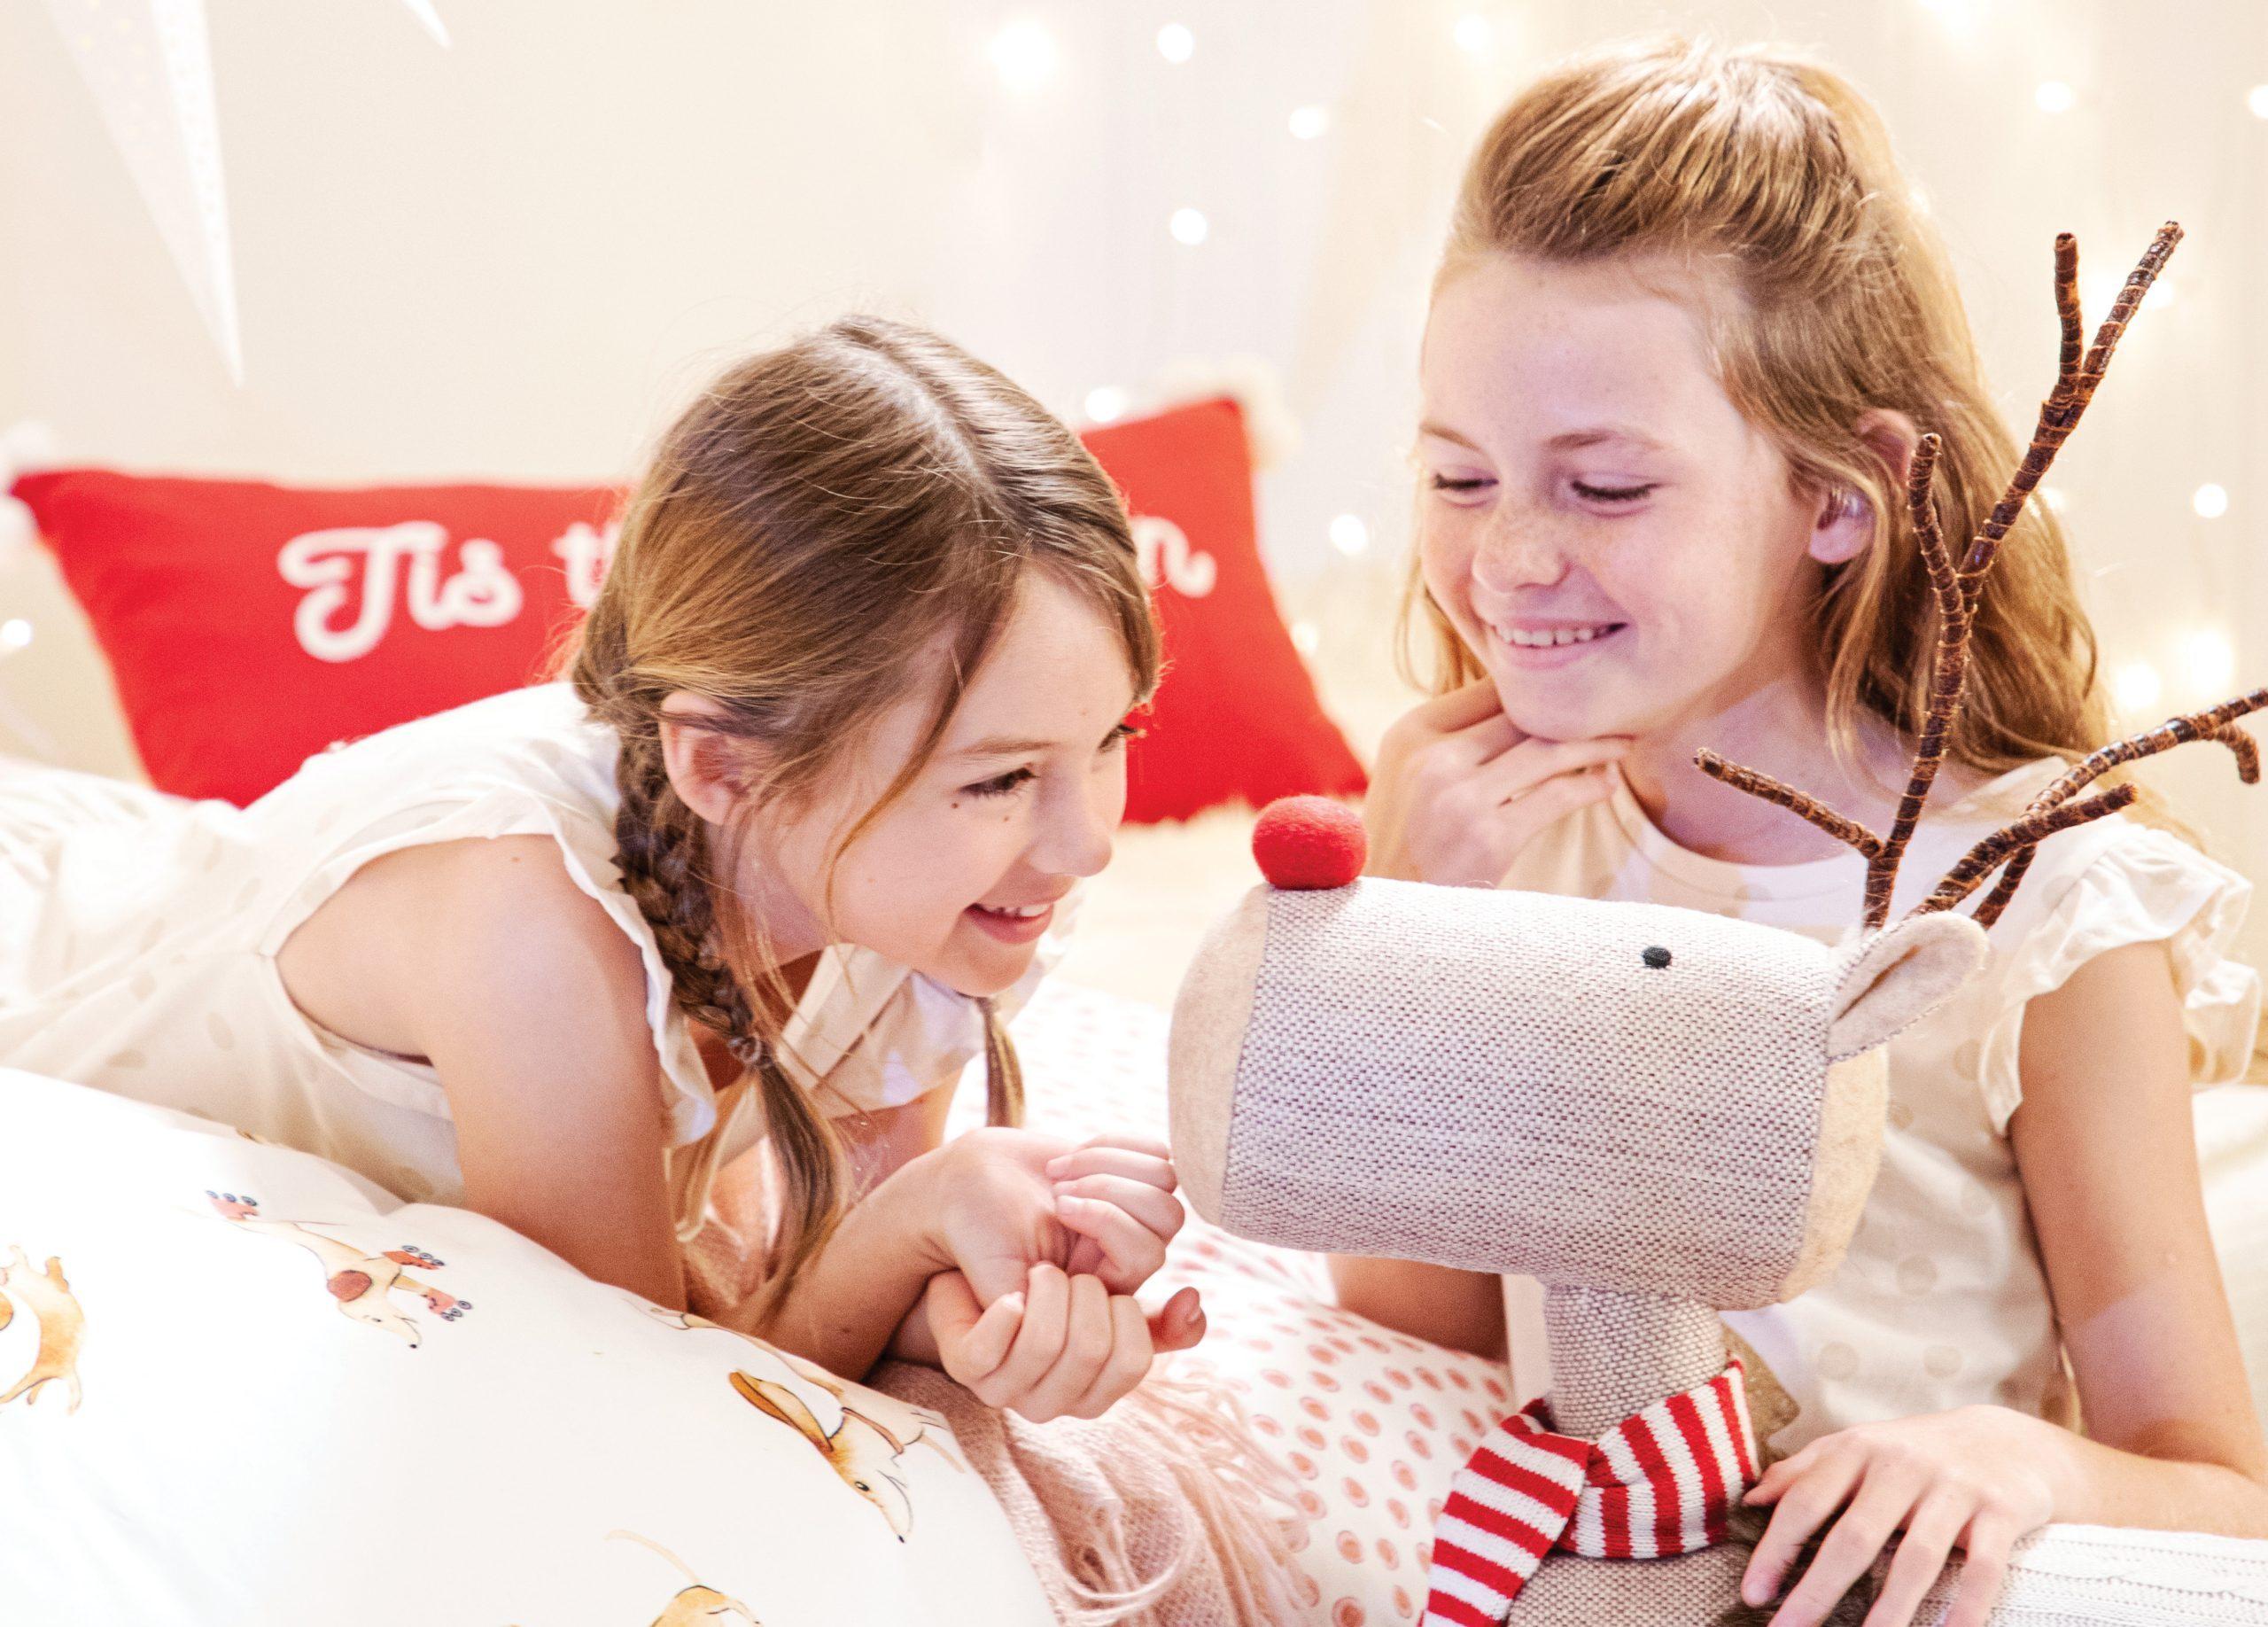 Magical Christmas memories and pillow talk